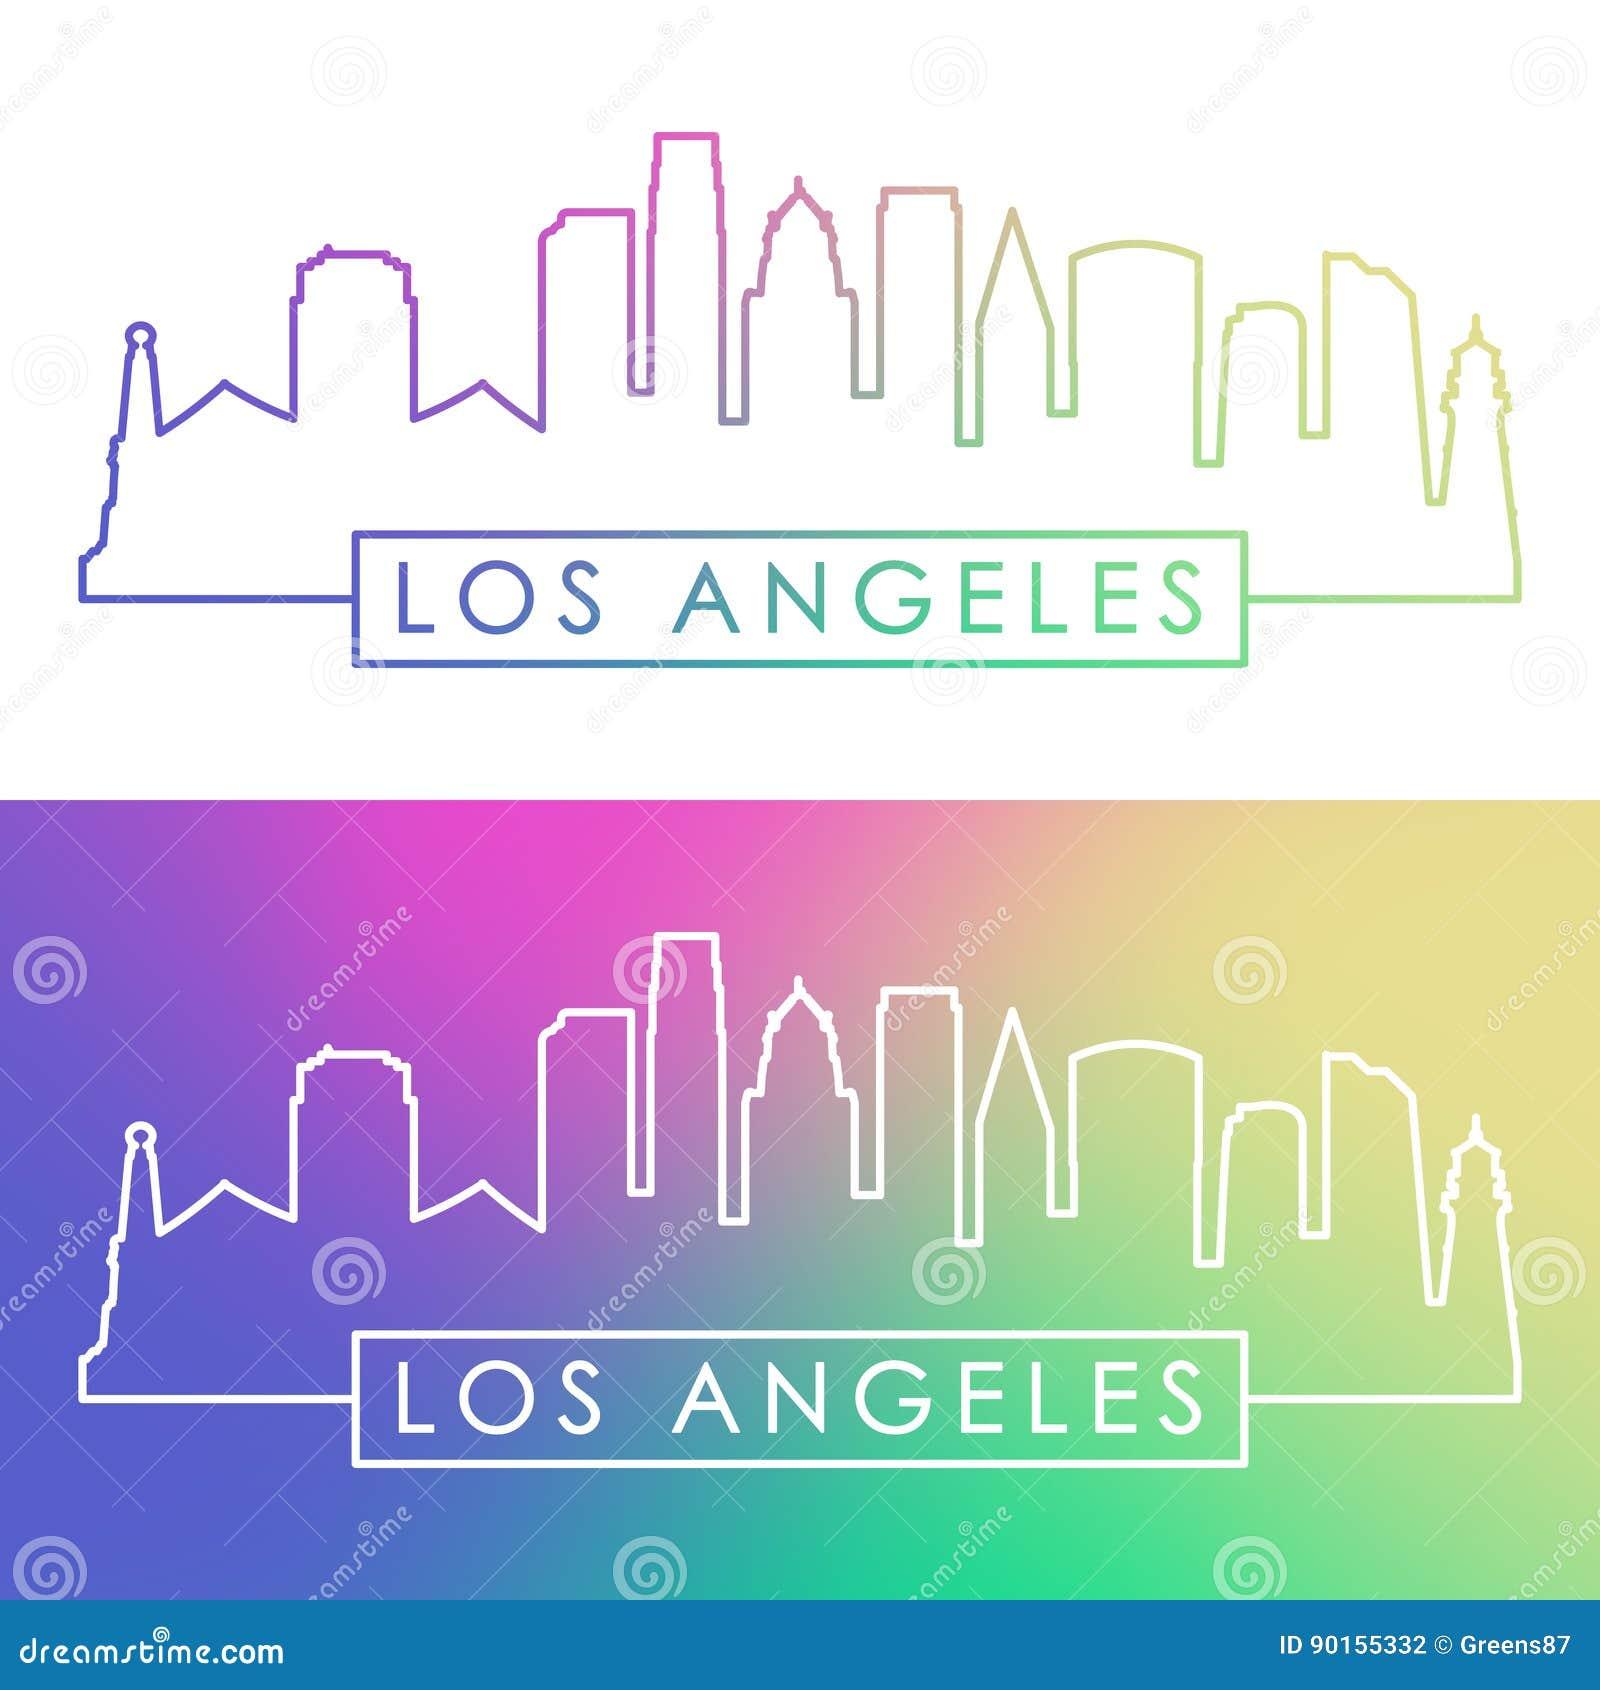 Los Angeles da baixa #41